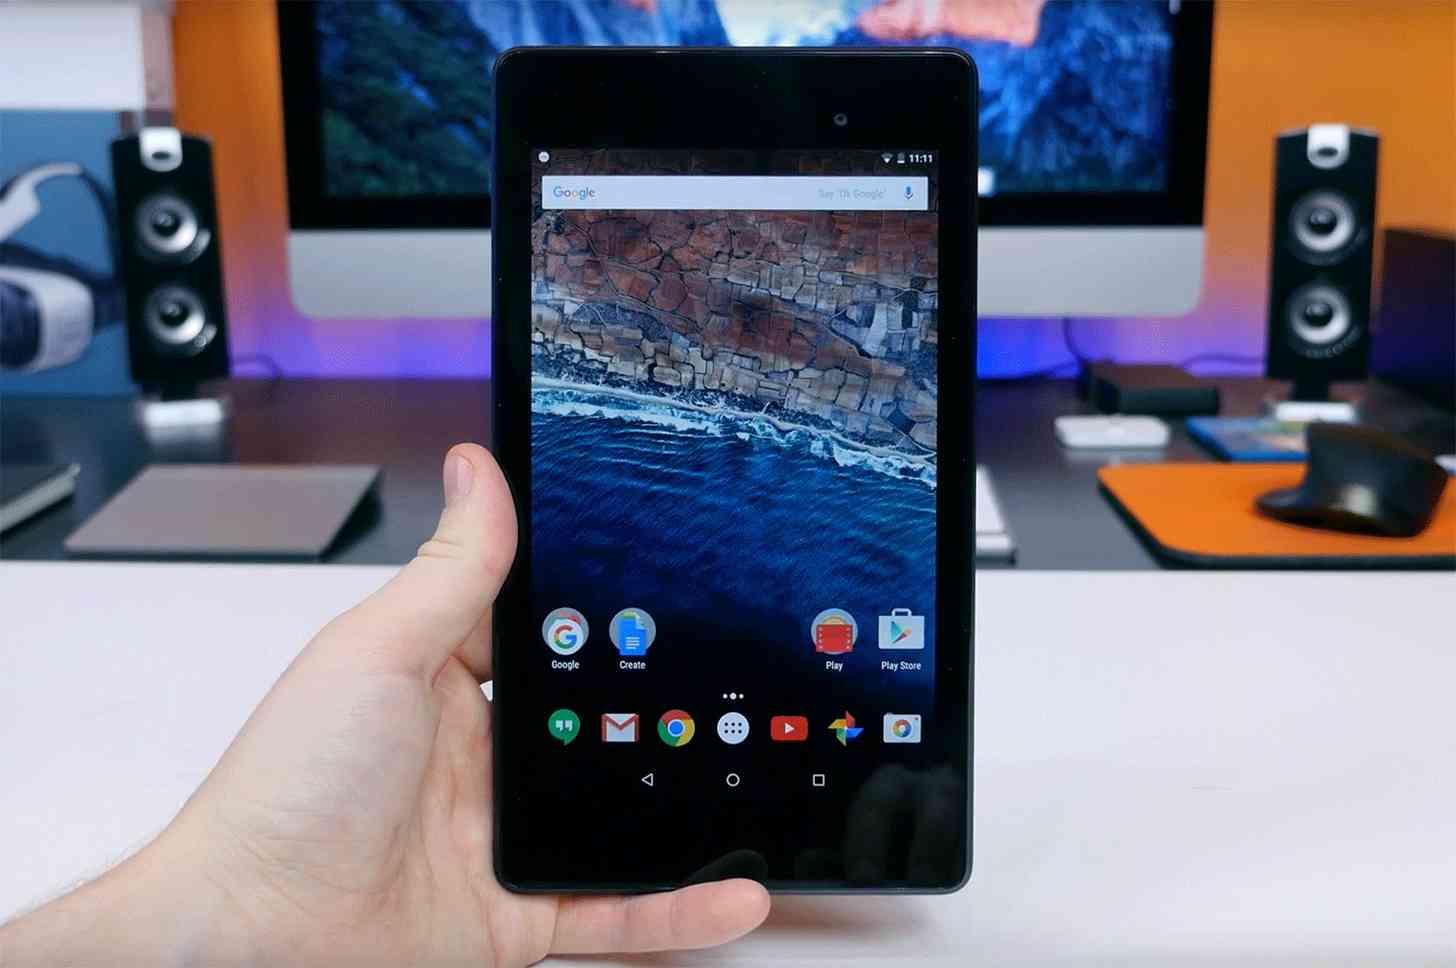 Nexus 7 (2013) Android 6.0 hands on